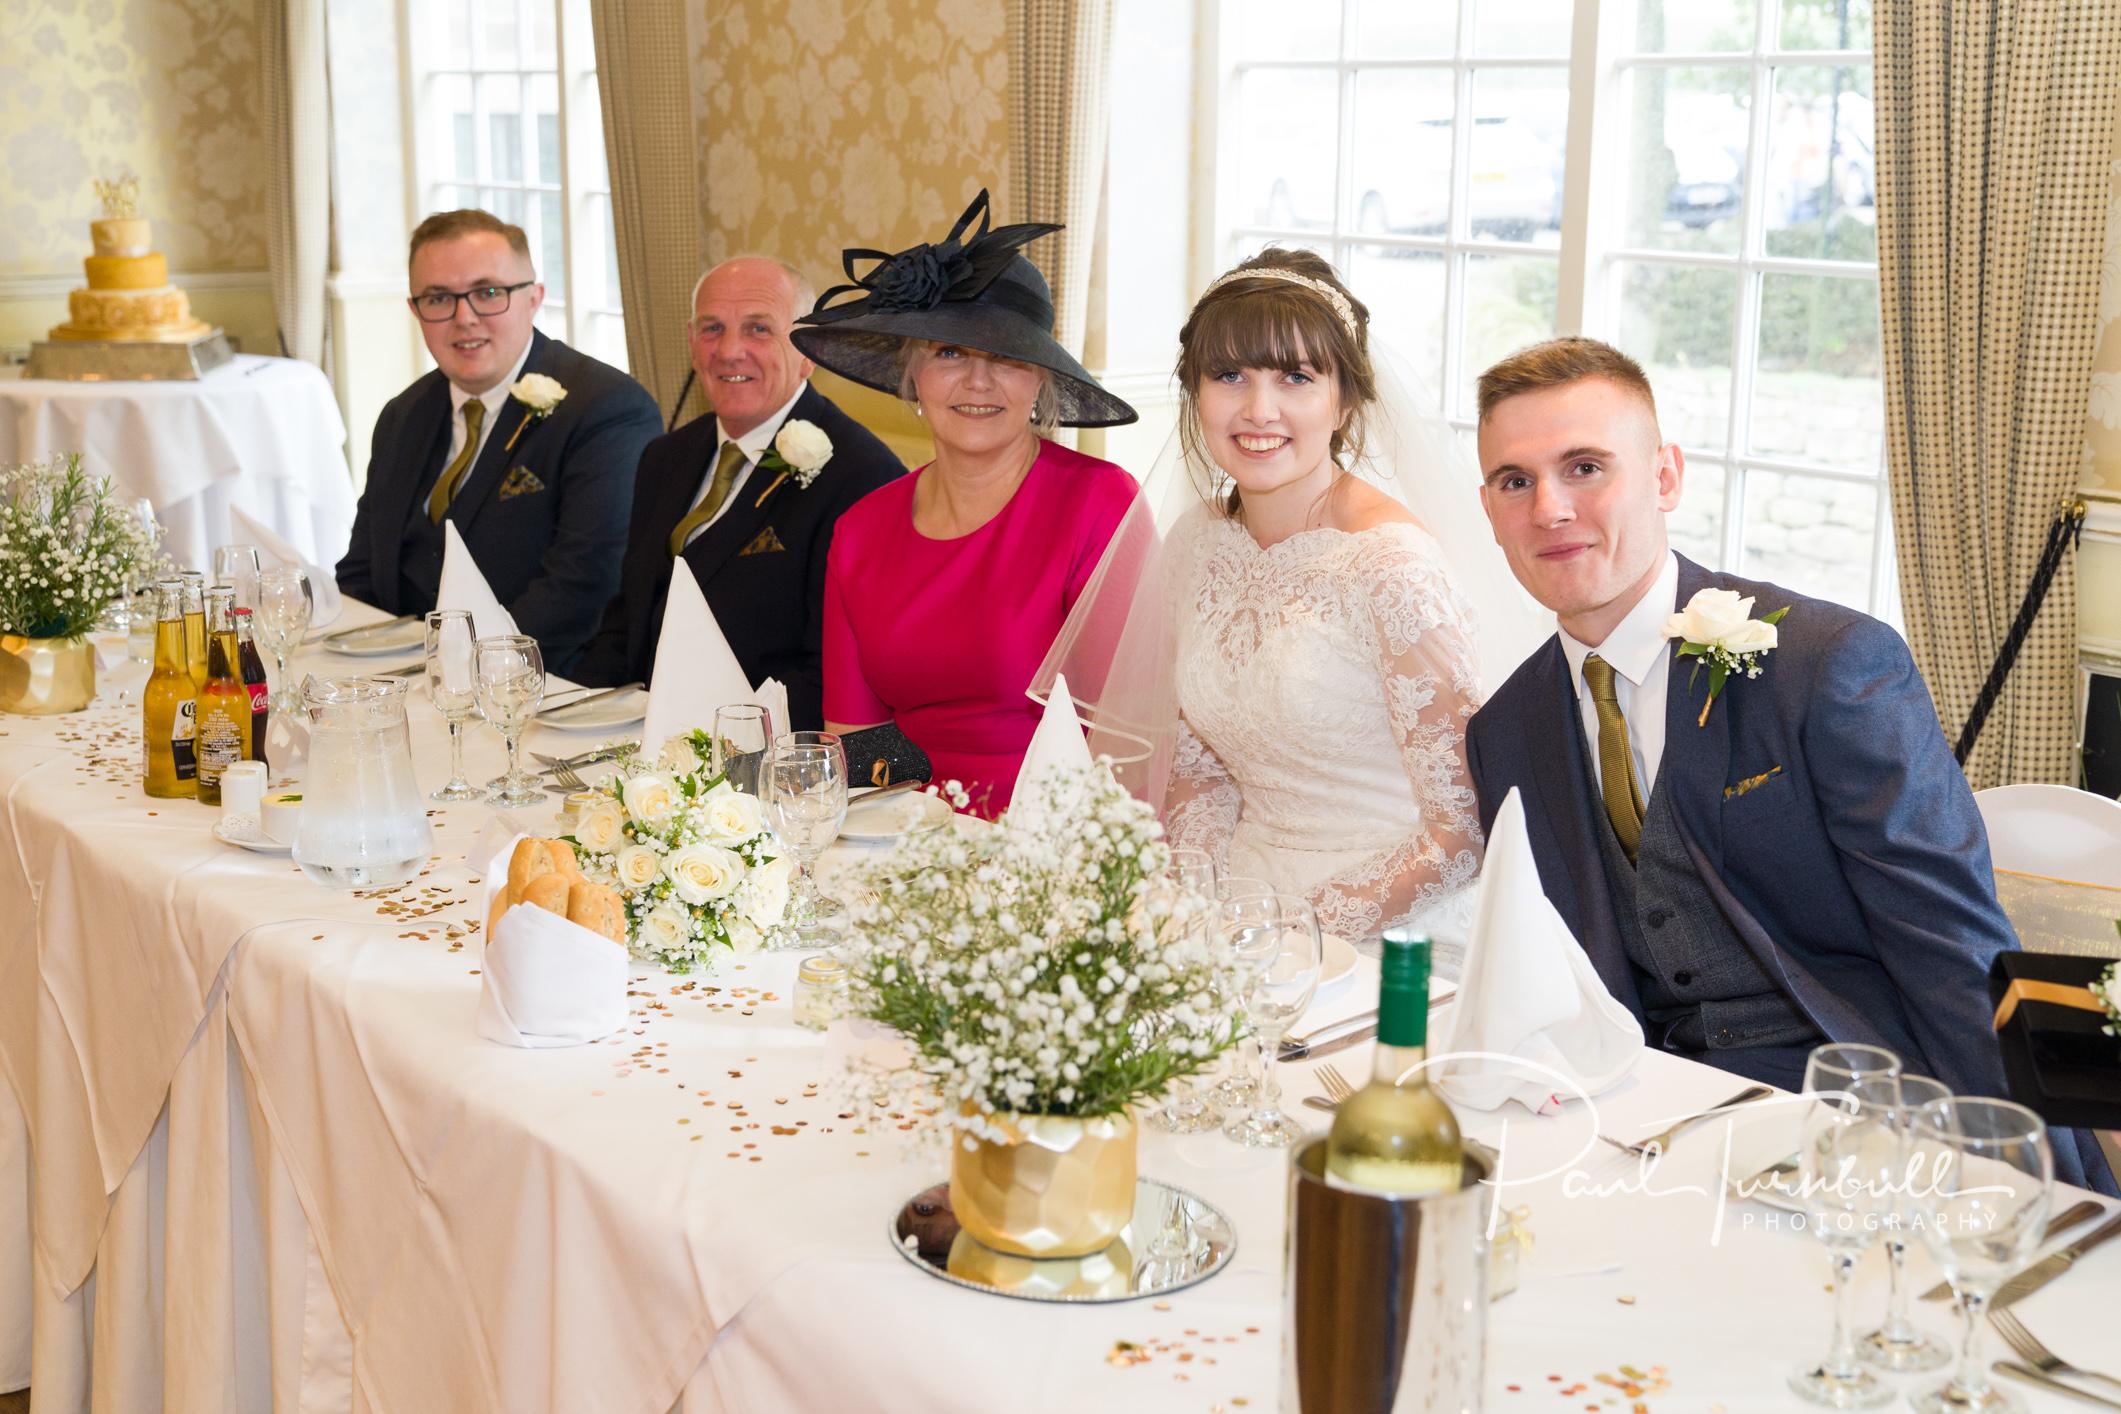 wedding-photographer-raven-hall-ravenscroft--scarborough-yorkshire-lucy-ryan-074.jpg